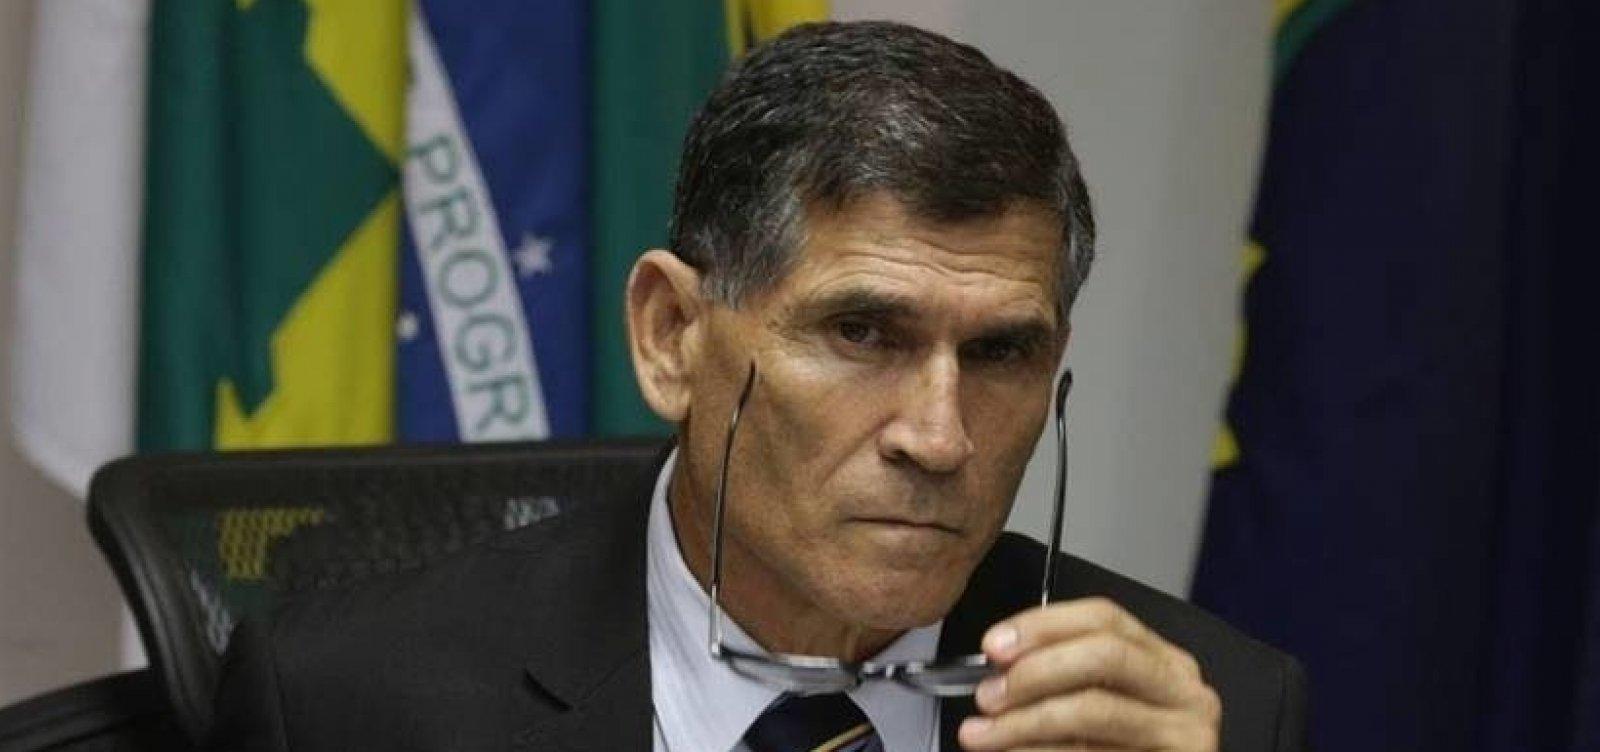 [Ministro contraria Bolsonaro e assegura permanência da EBC]